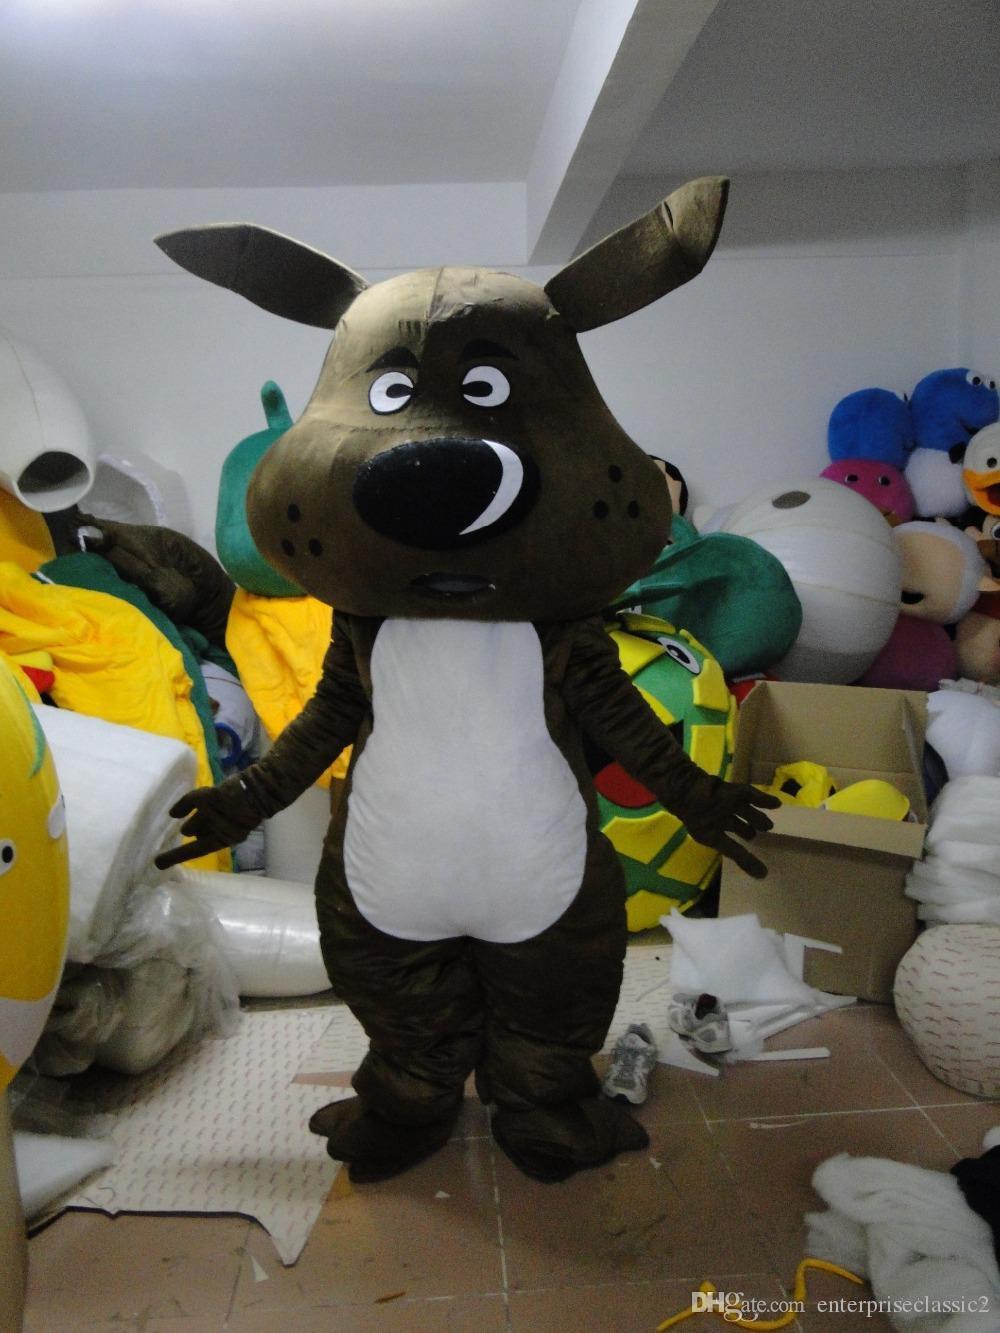 Siyah Köpek Maskot Kostümleri Animasyonlu tema Hayvan Cospaly Karikatür maskot Karakter Cadılar Bayramı Karnaval parti Kostüm